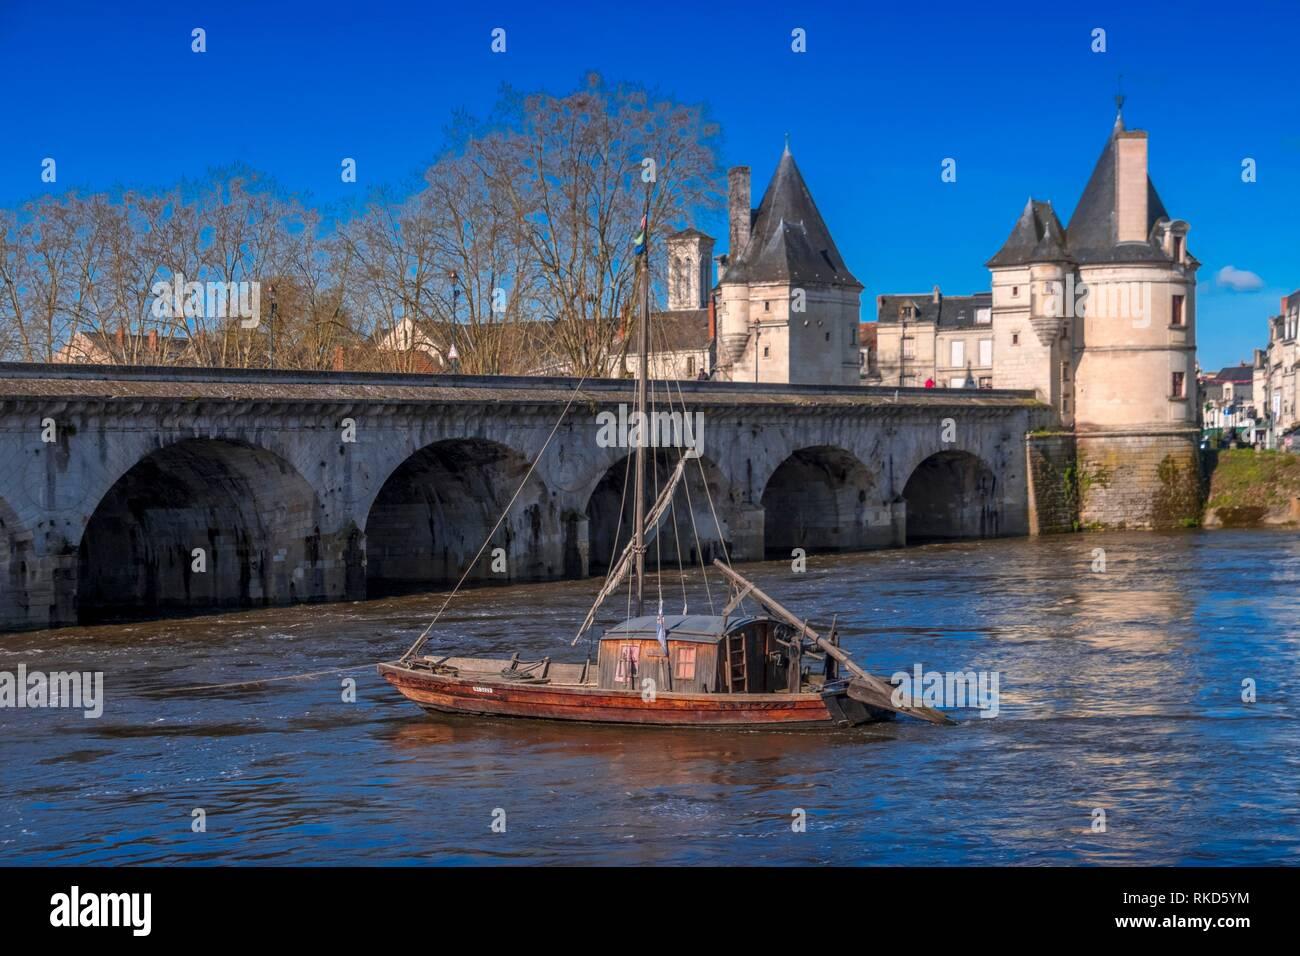 France, Nouvelle Aquitaine, Vienne, Chatelrault: Henri IV bridge over the Vienne river. - Stock Image